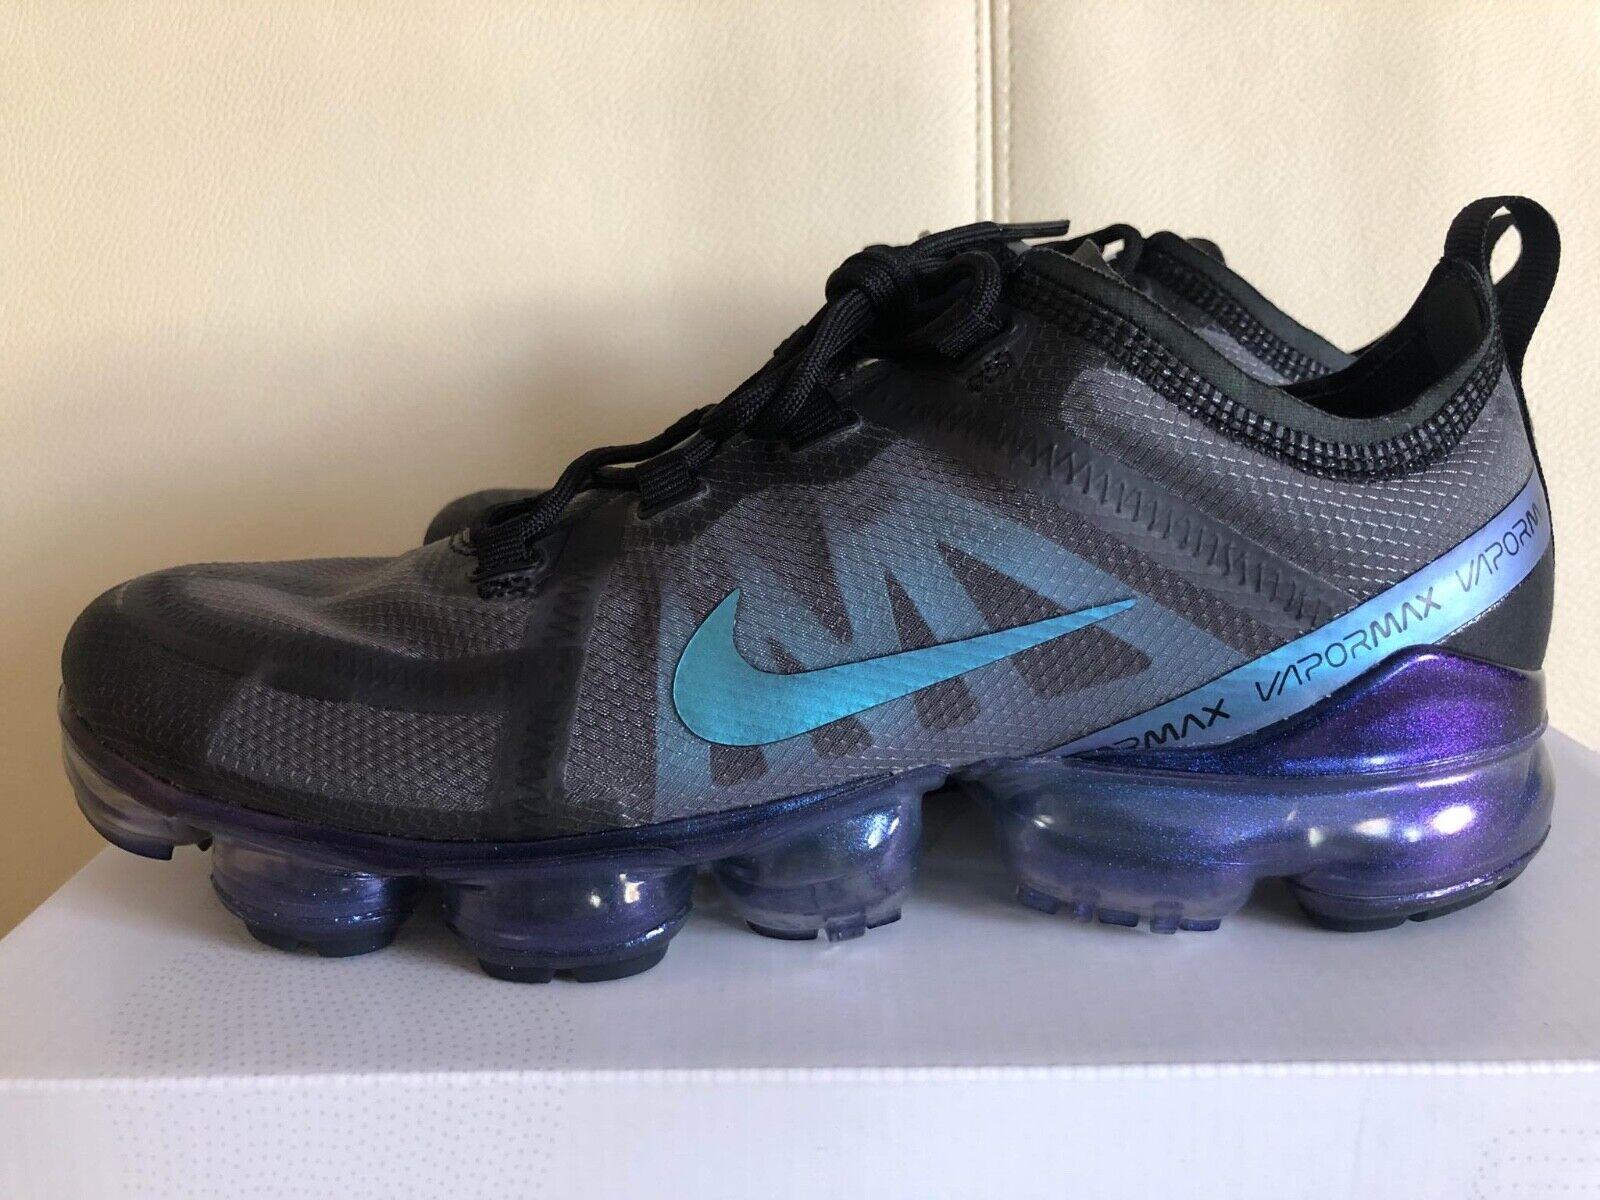 Nike Air VaporMax 2019 Run Utility AR6631-001 Vapormax Running scarpe scarpe da ginnastica